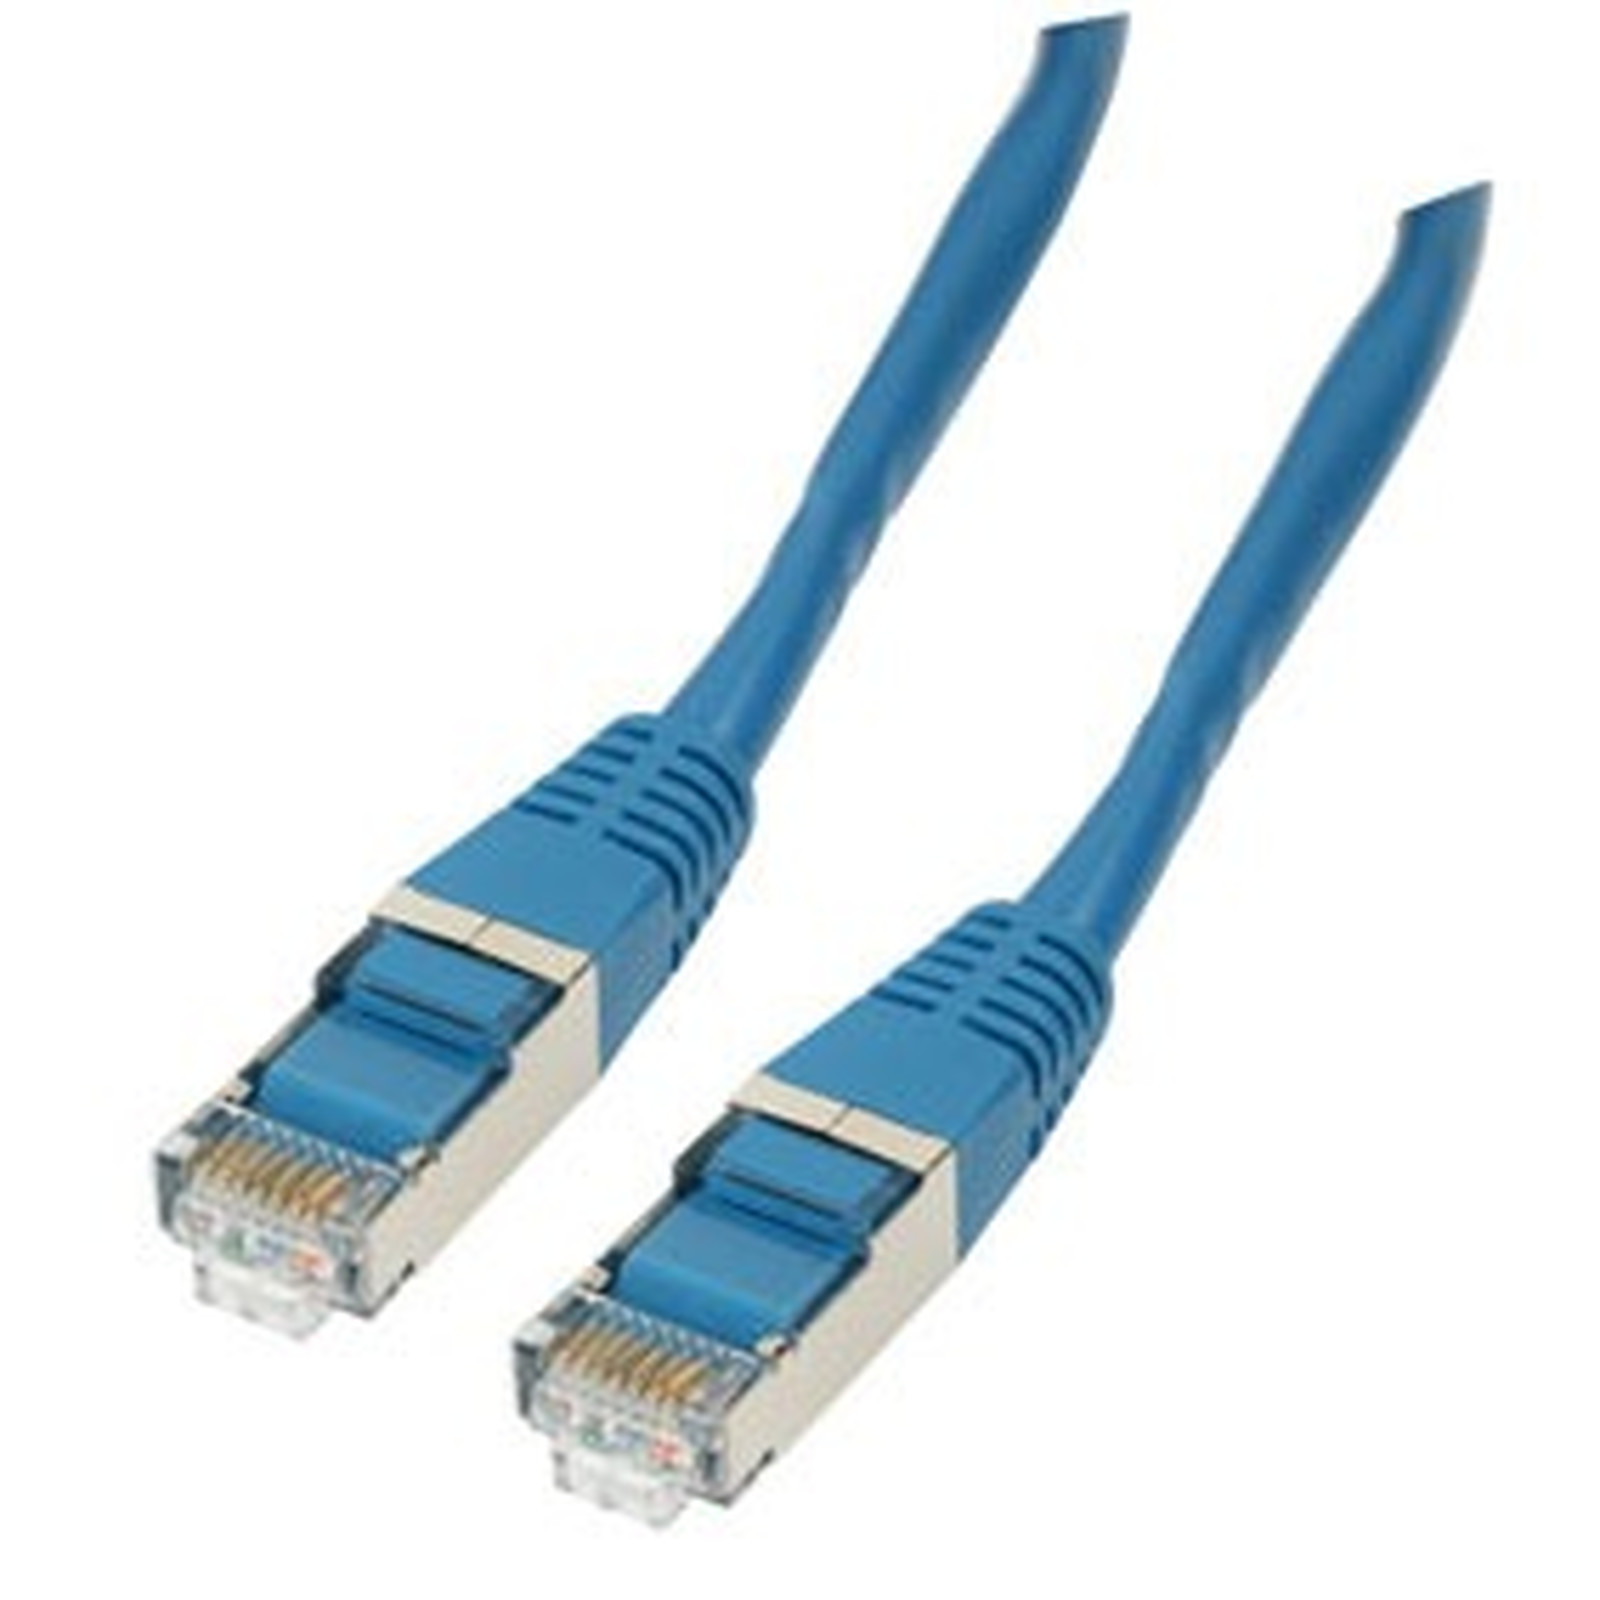 Câble RJ45 catégorie 6 F/UTP 1 m (Bleu)